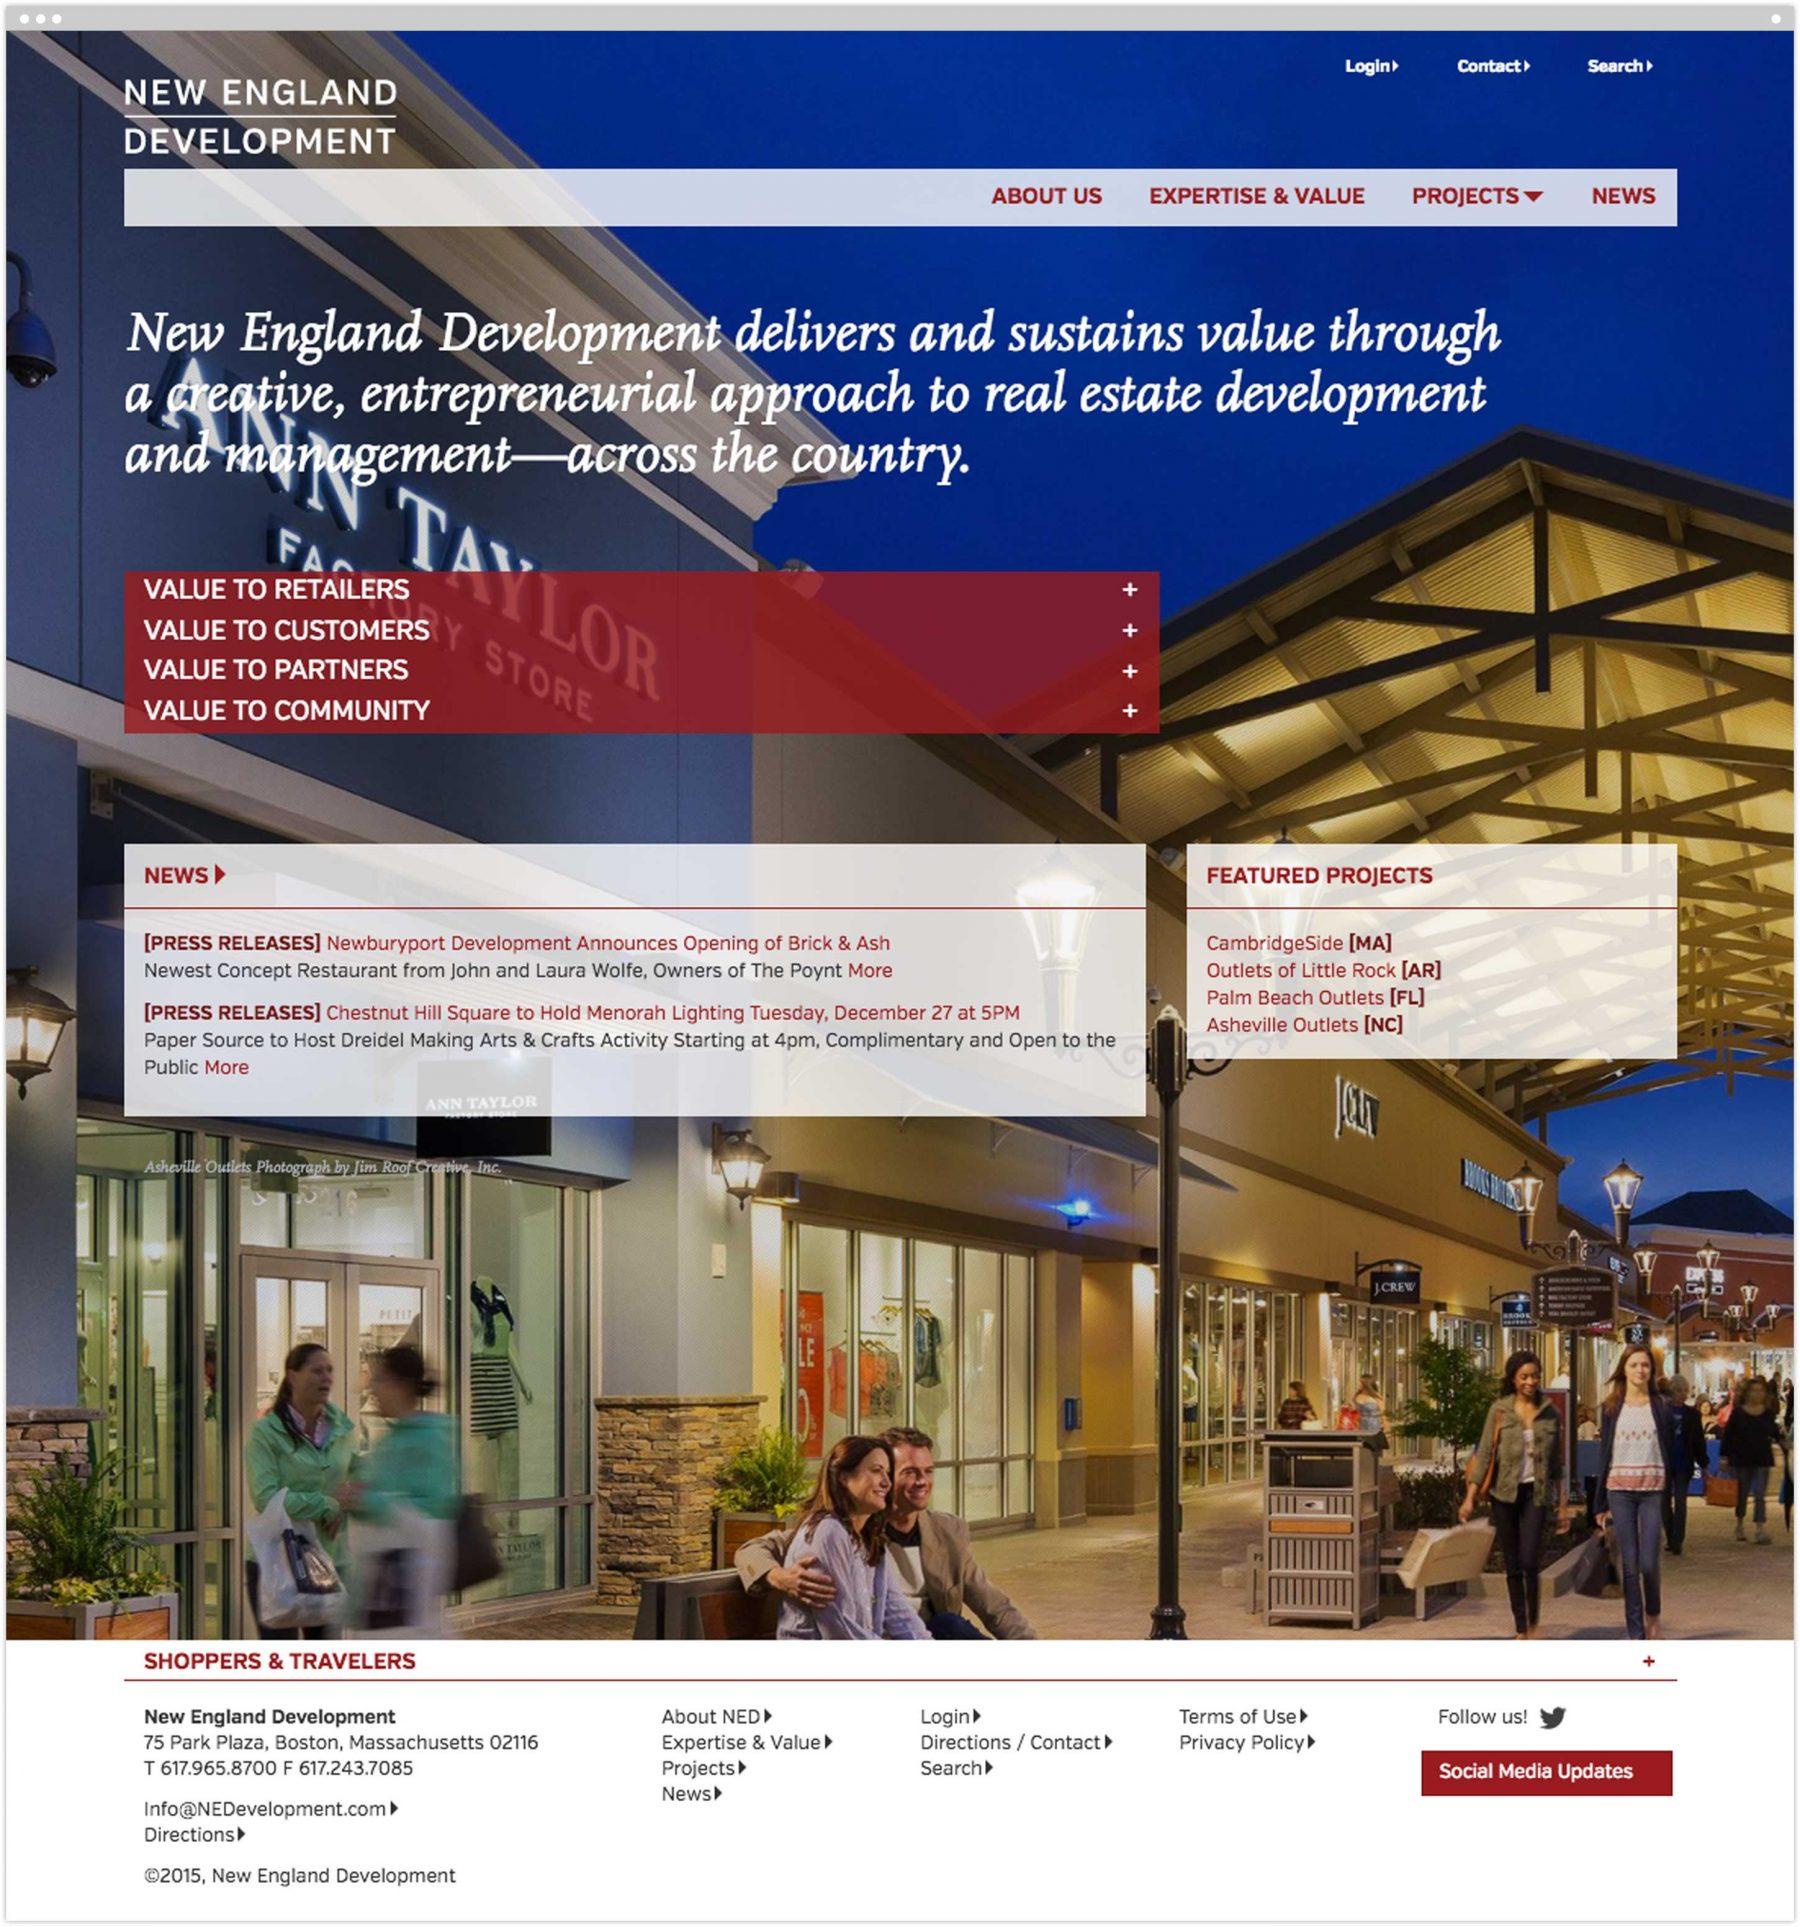 New England Development homepage